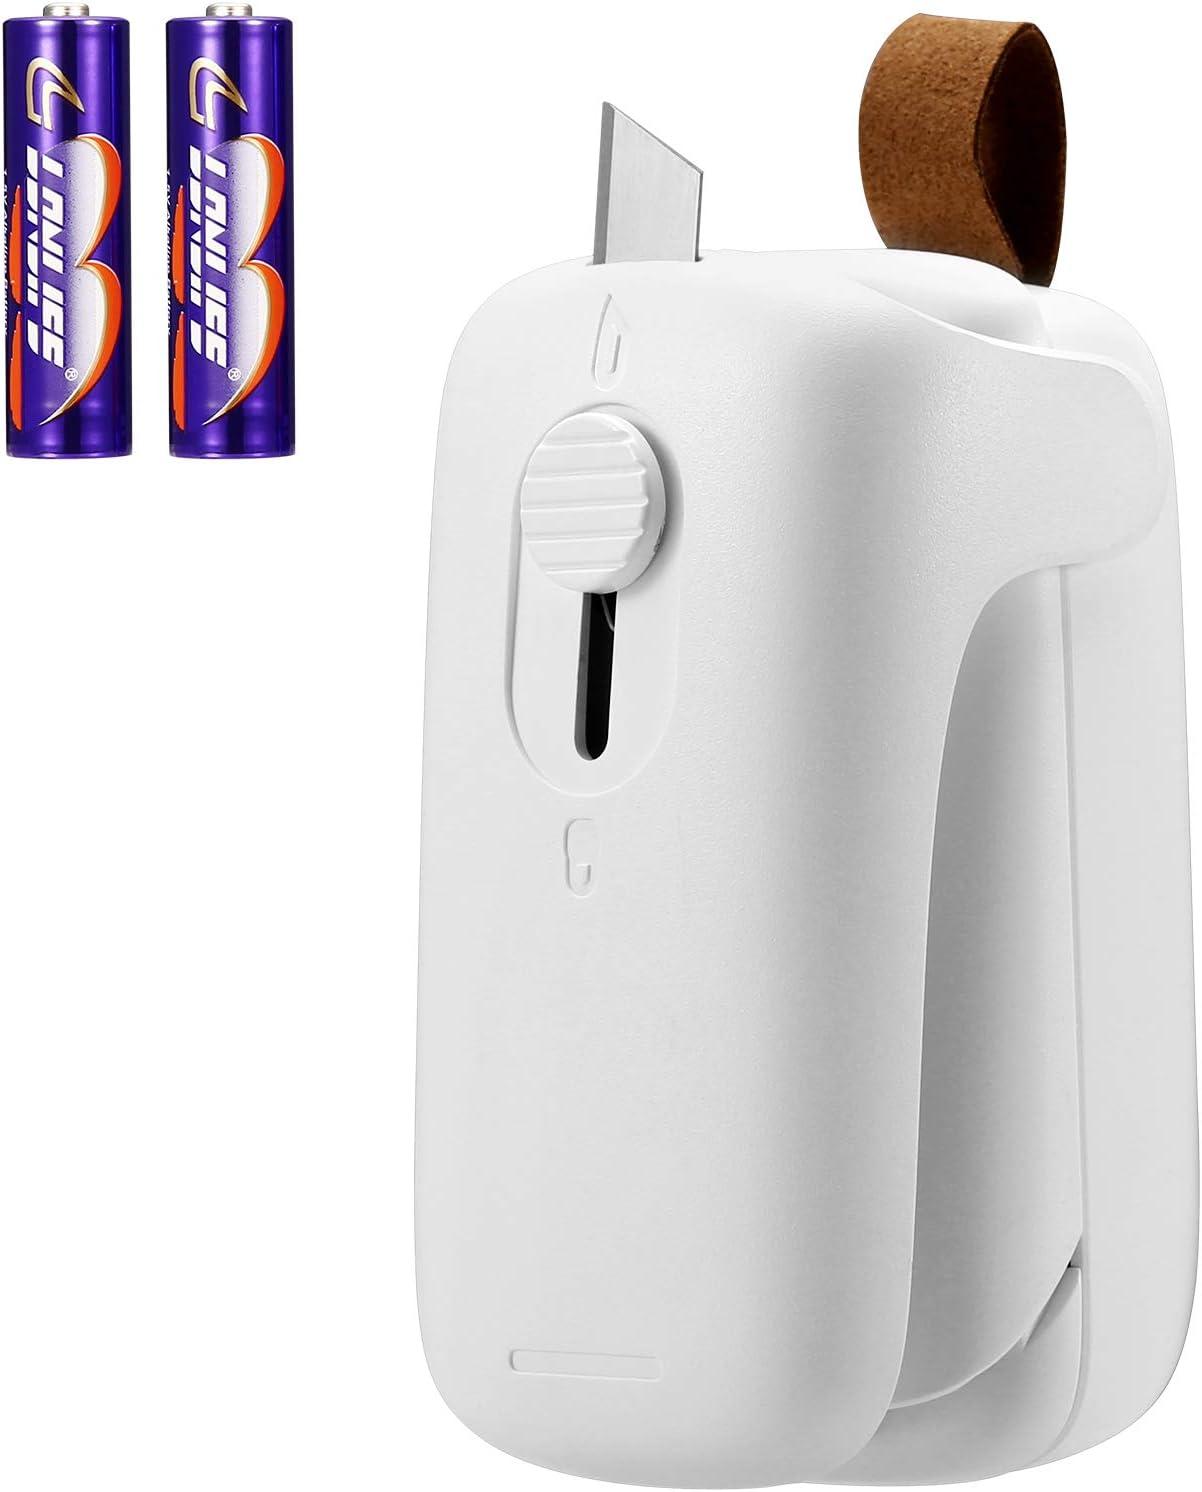 KeeKit Mini Bag Sealer, 2 in 1 Heat Sealer and Cutter, Handheld Bag Heat Vacuum Sealers, Sealing Machine Portable for Plastic Bags, Snack Fresh Bag, Food Storage (Battery Included) - White